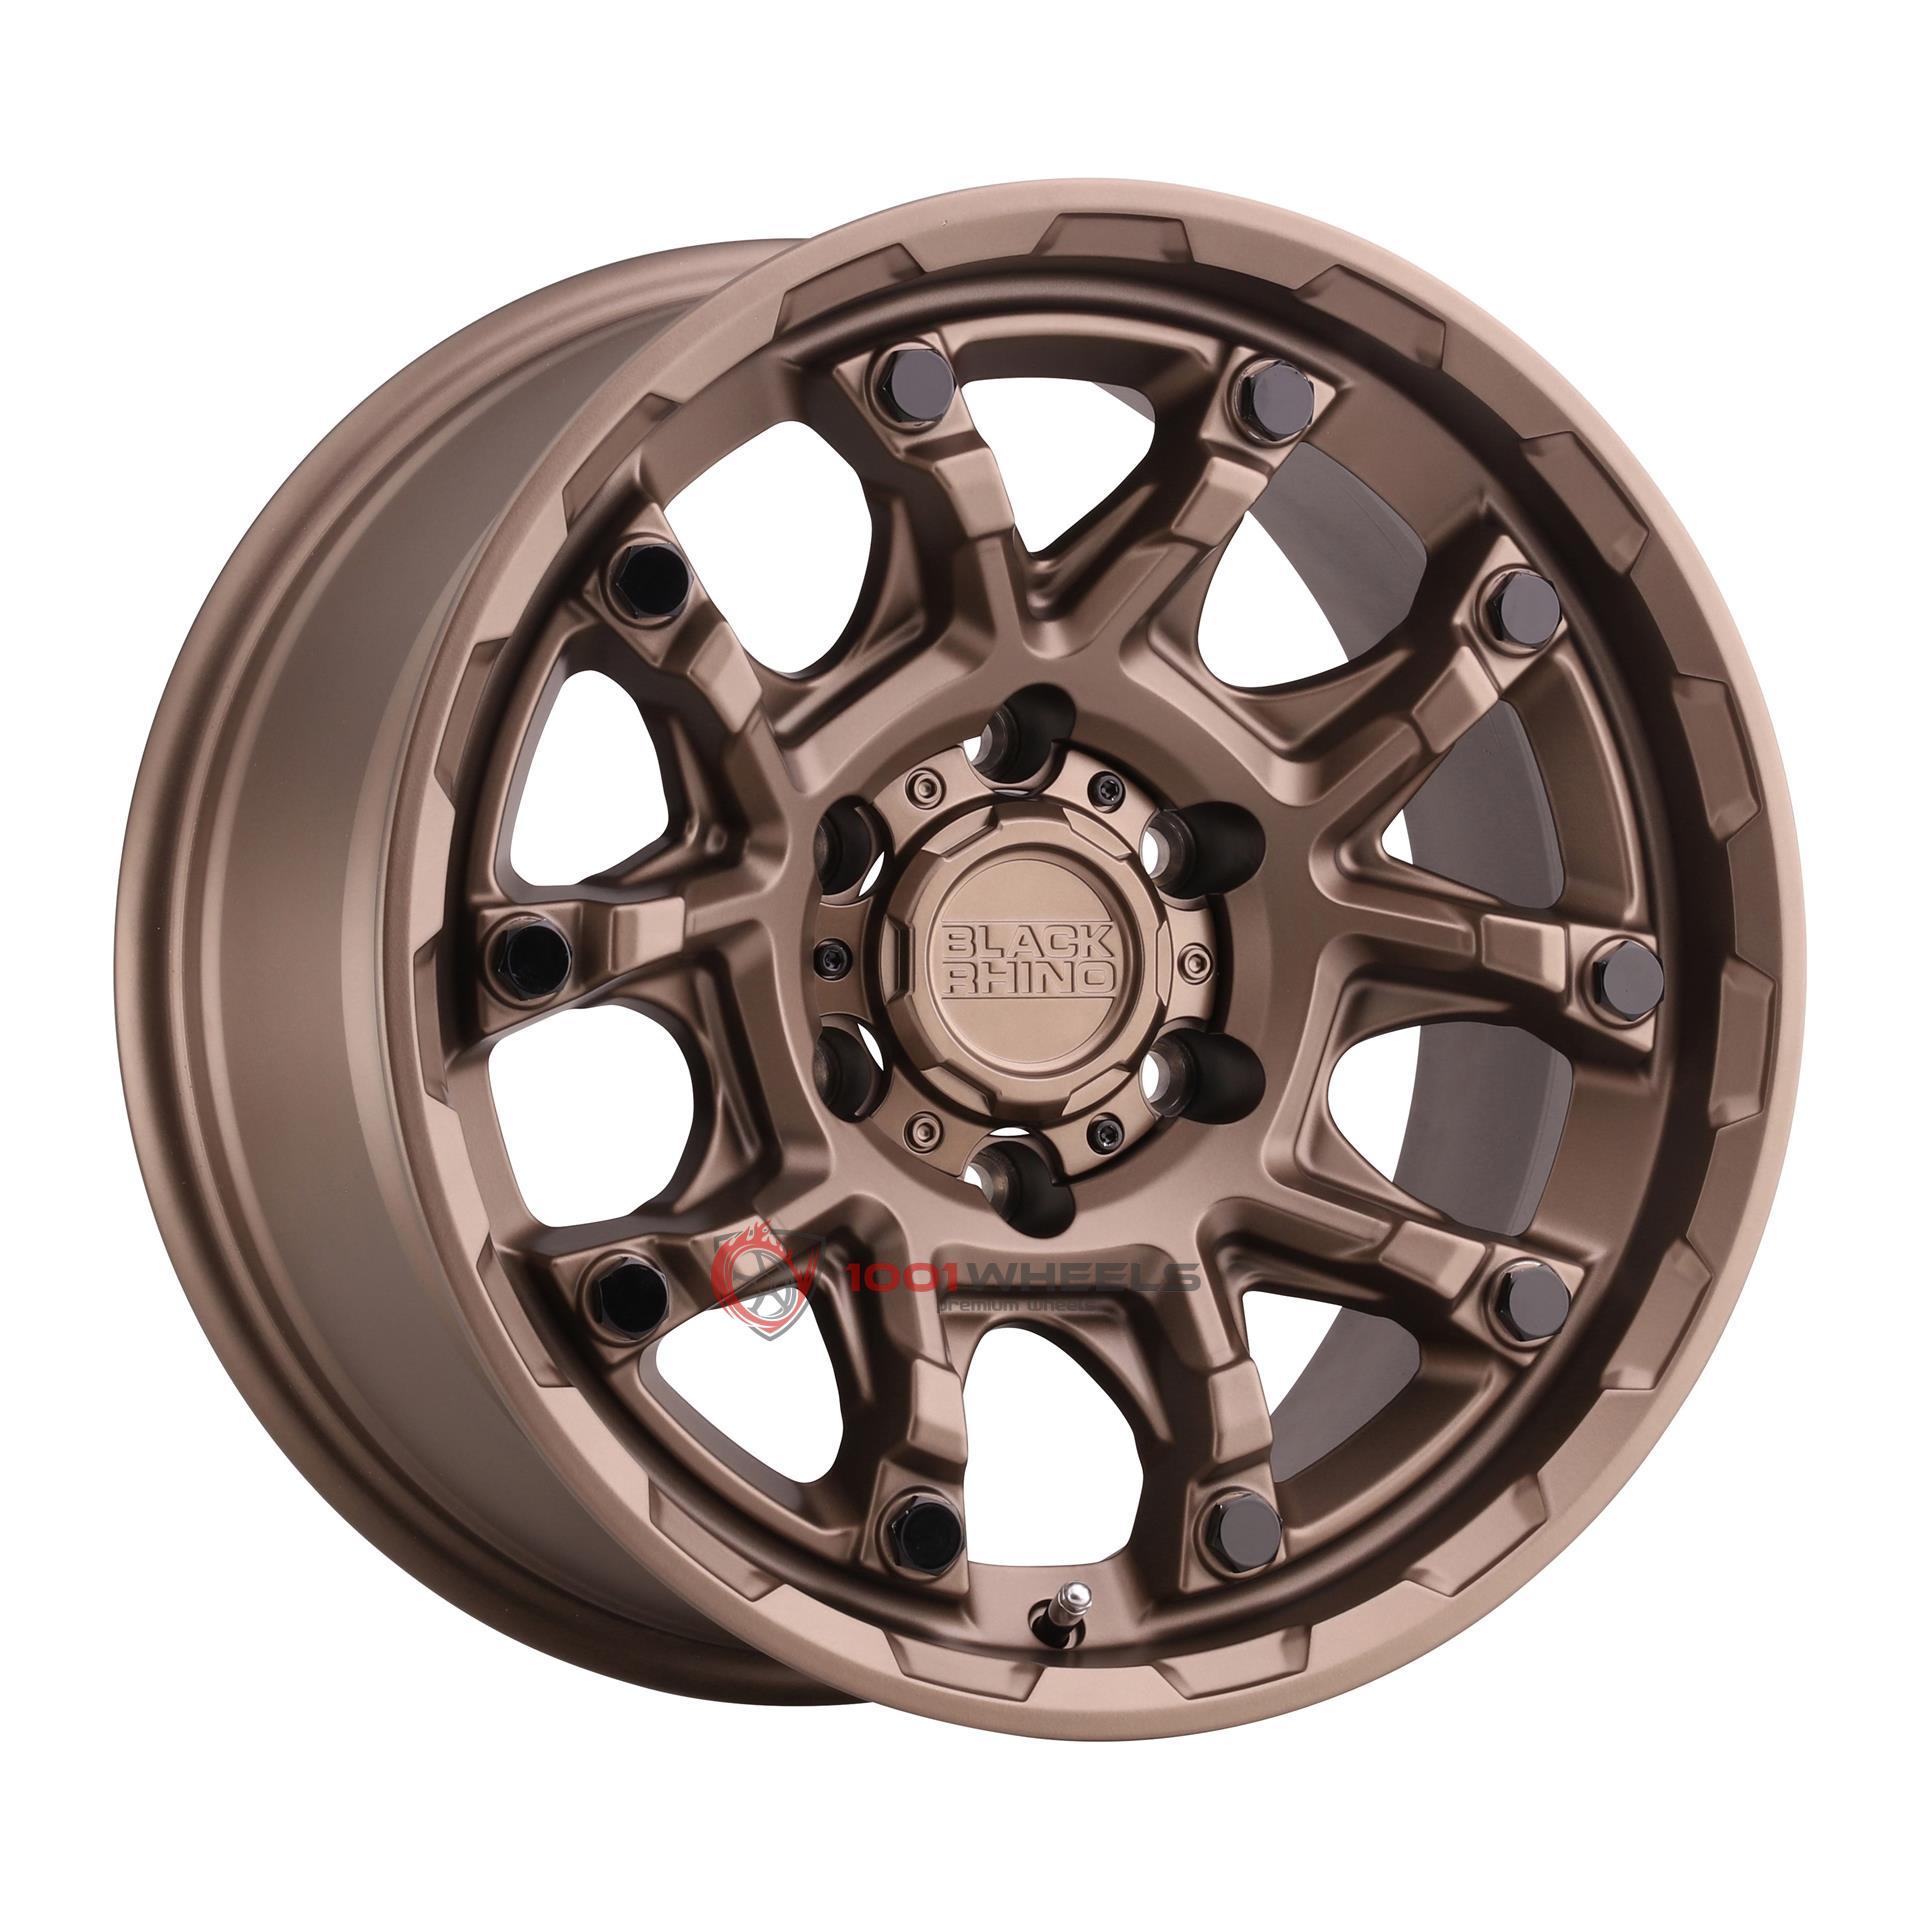 BLACK RHINO ARK bronze-wgloss-black-bolt